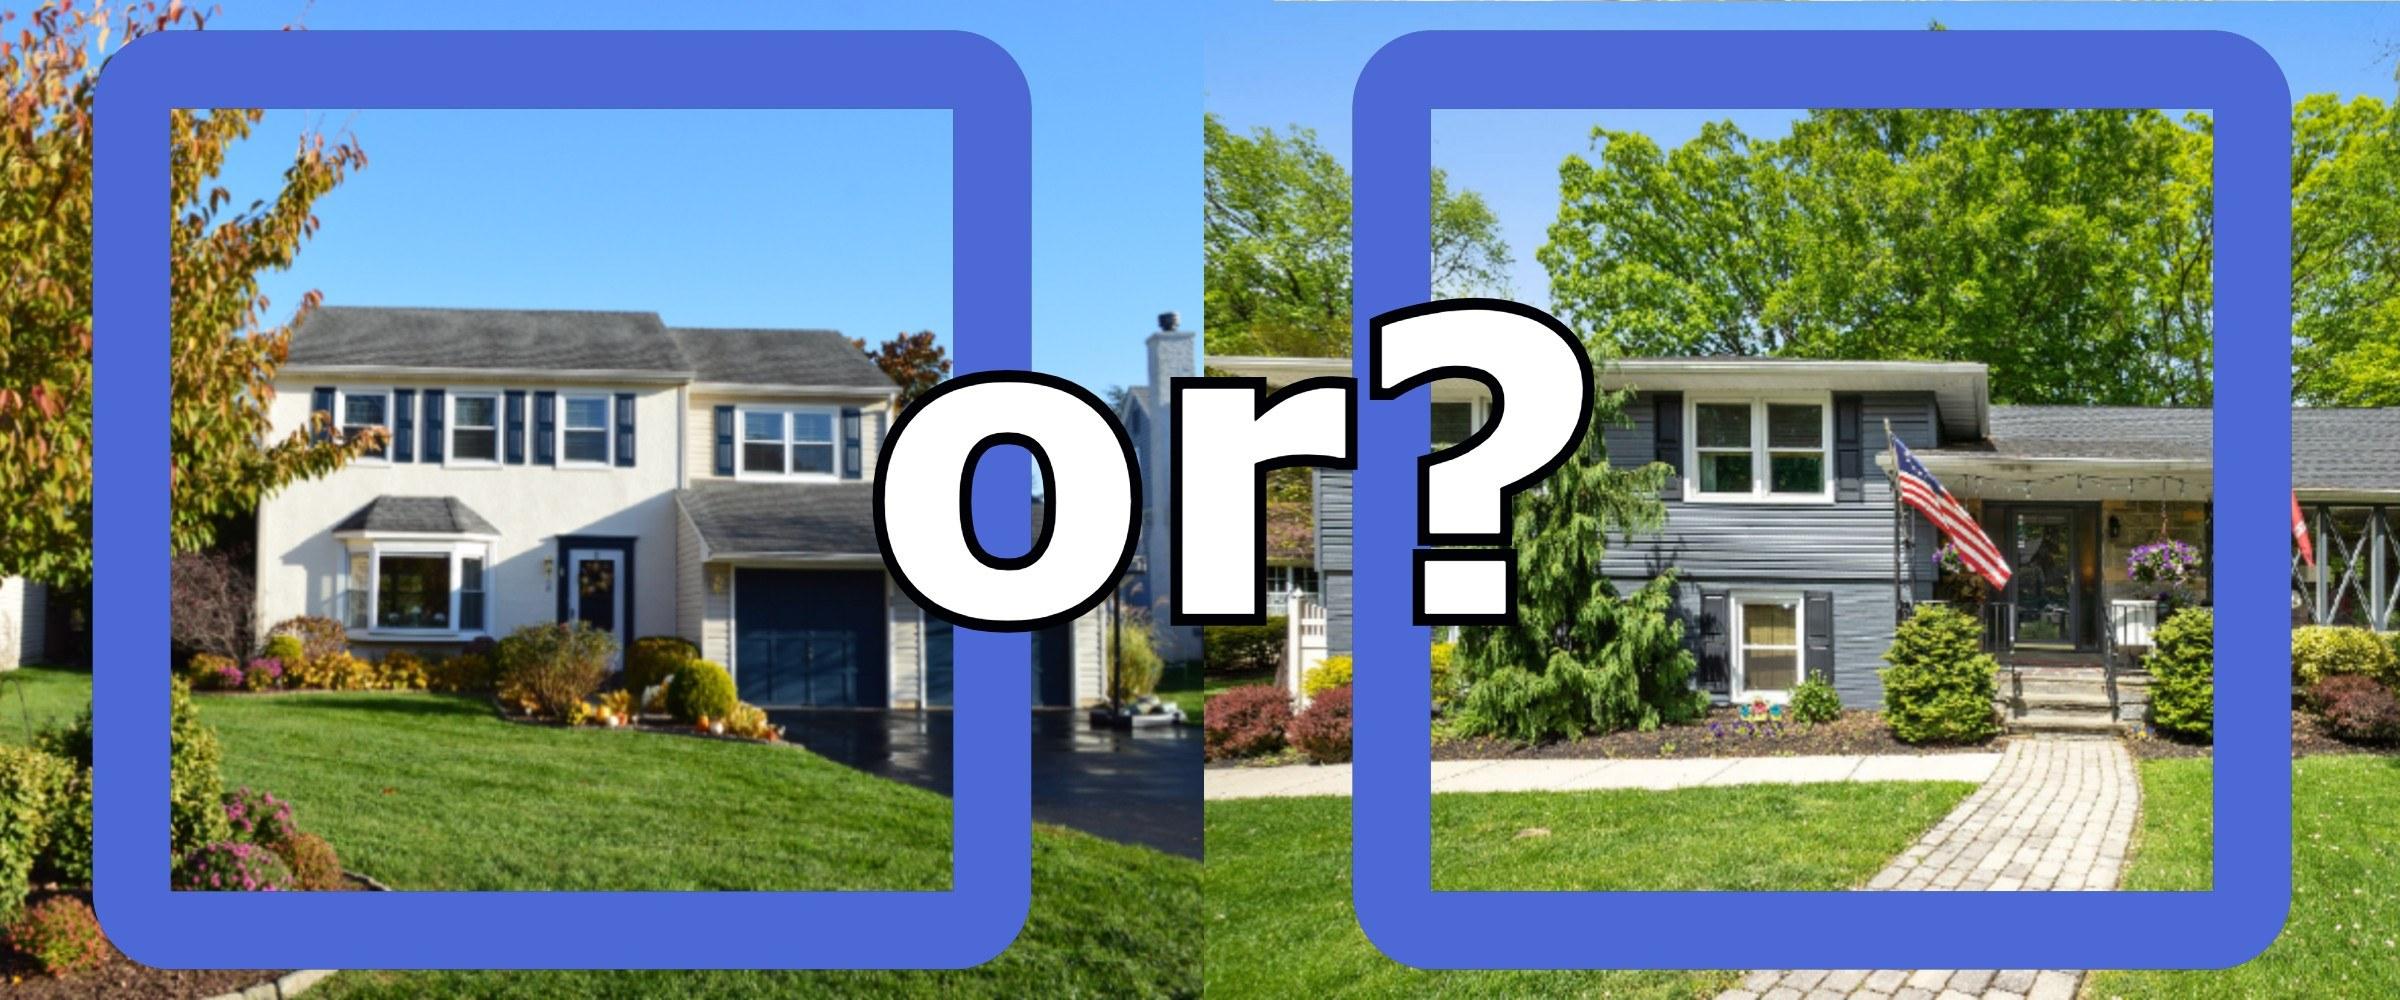 PA suburbs and NJ suburbs of Philadelphia